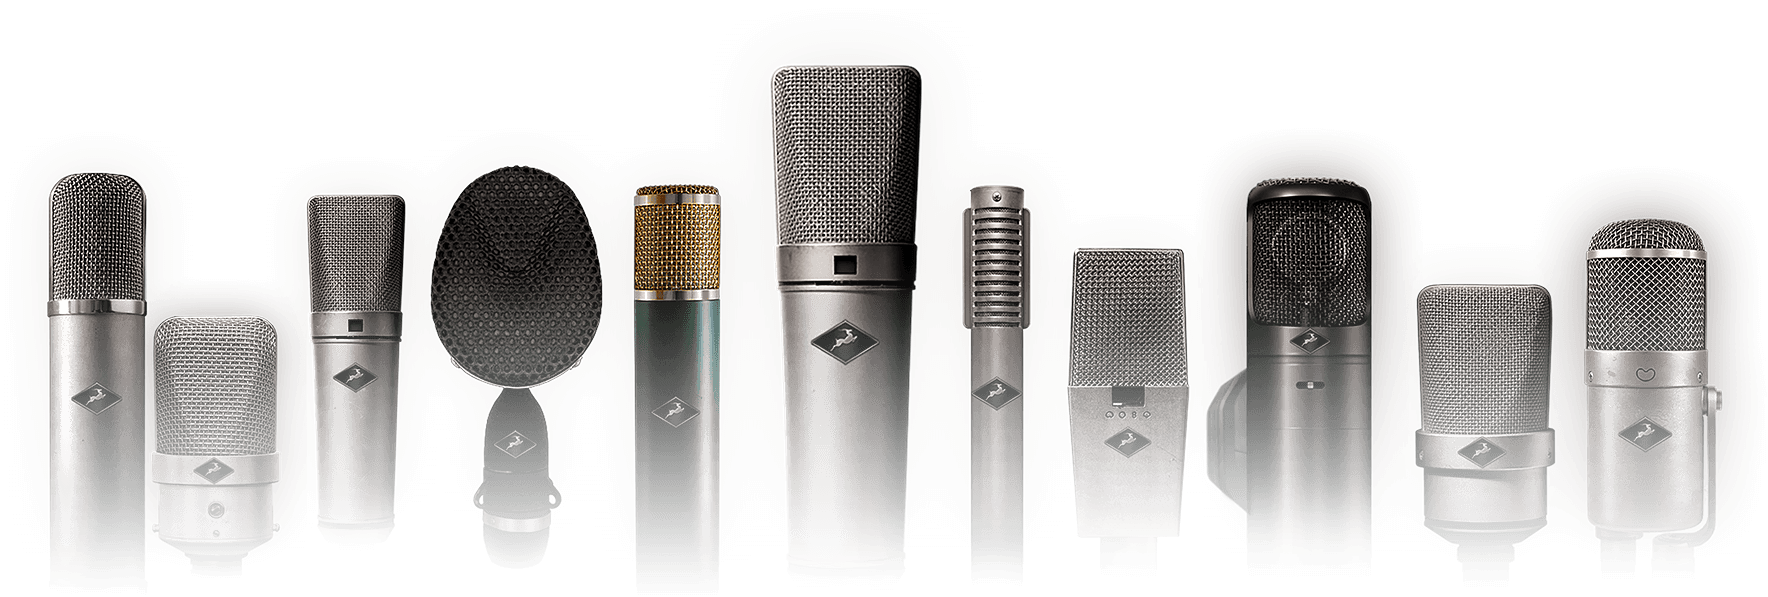 desc vintage mic 1 1